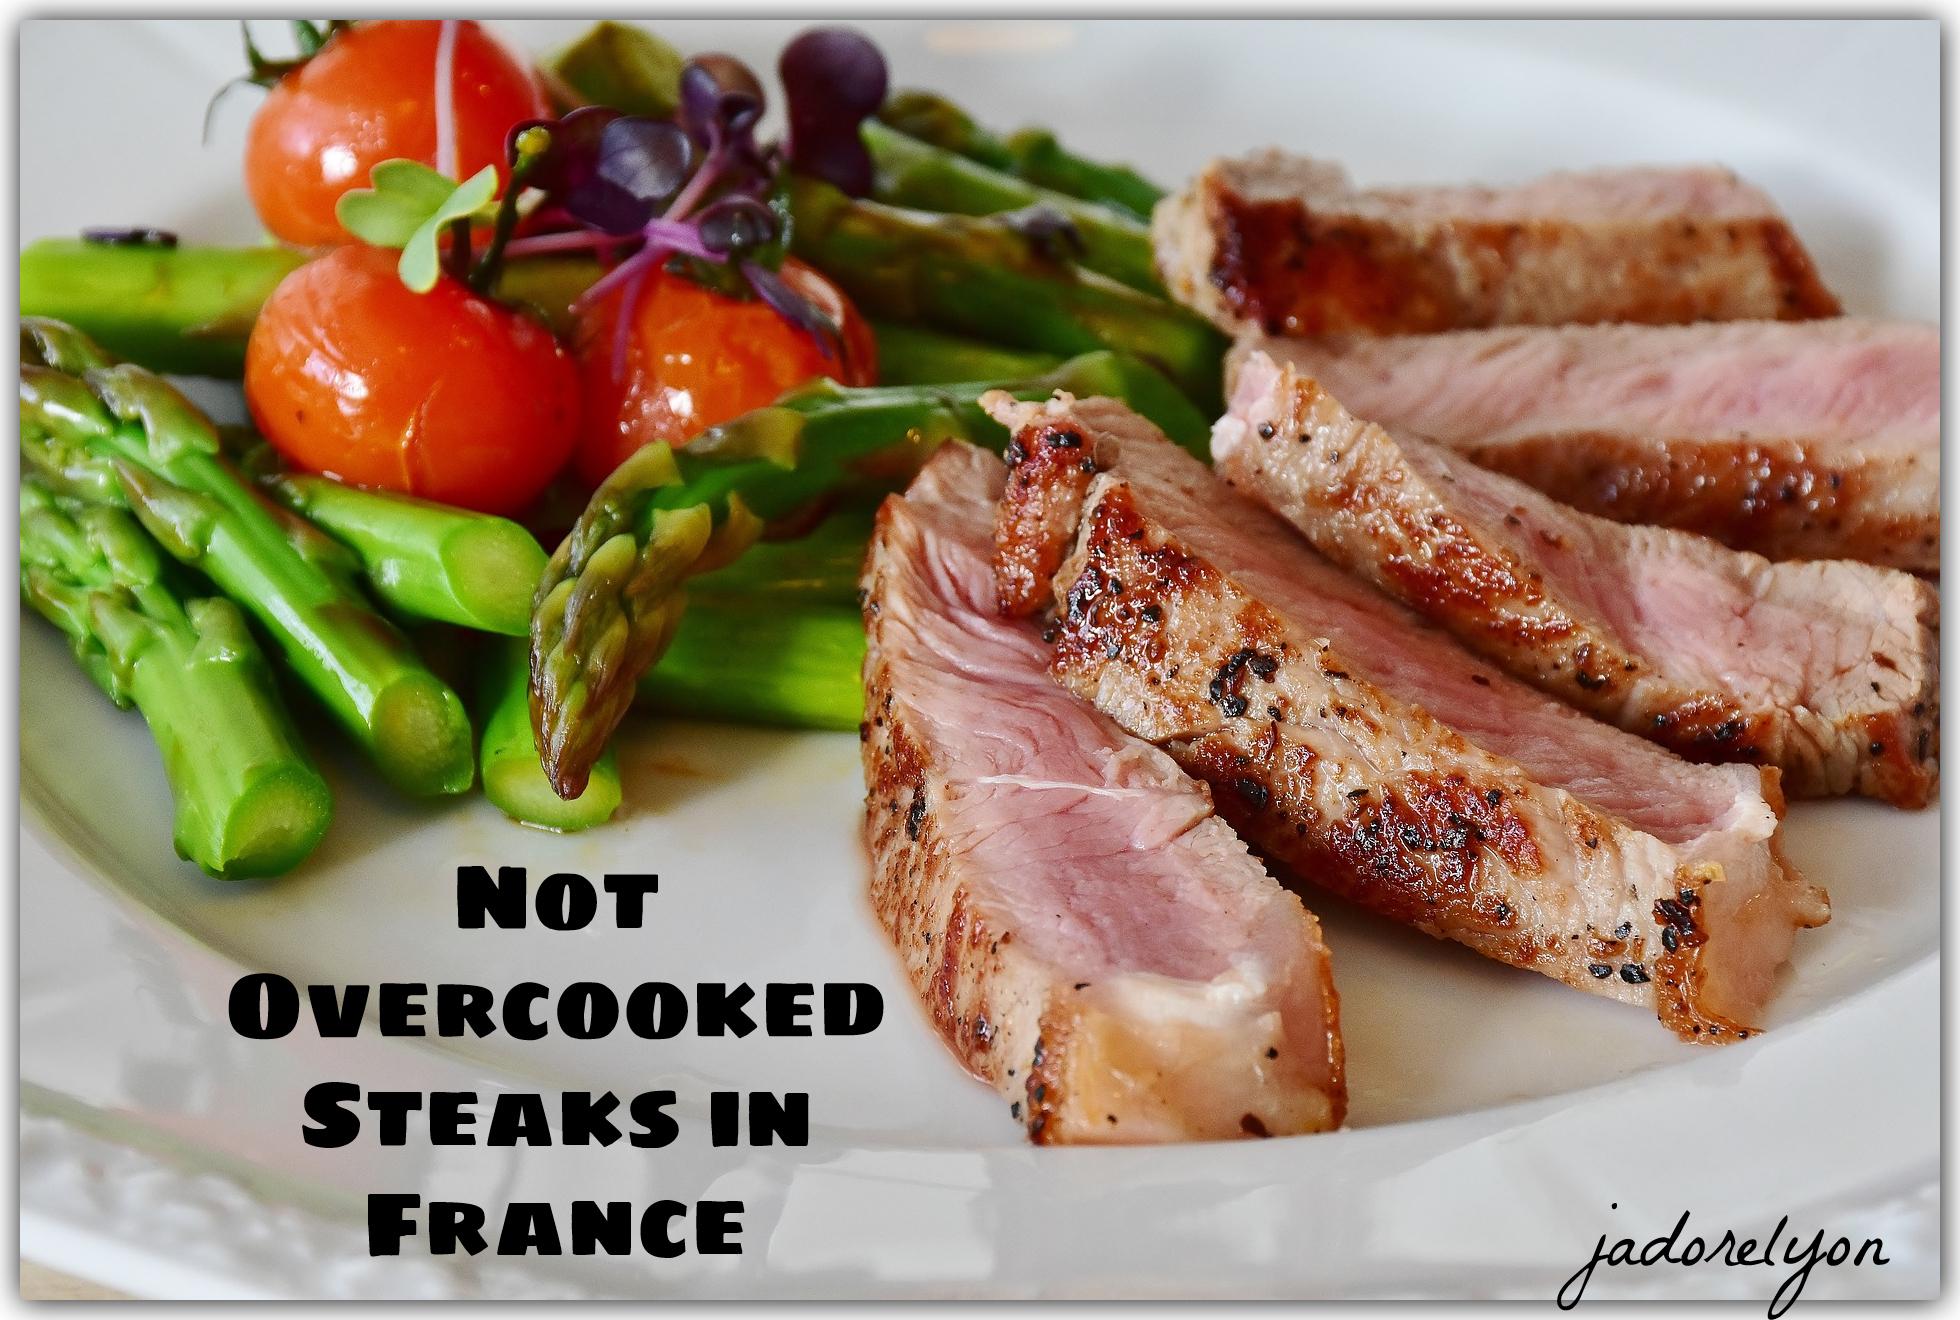 Avoid asking for well done steaks.